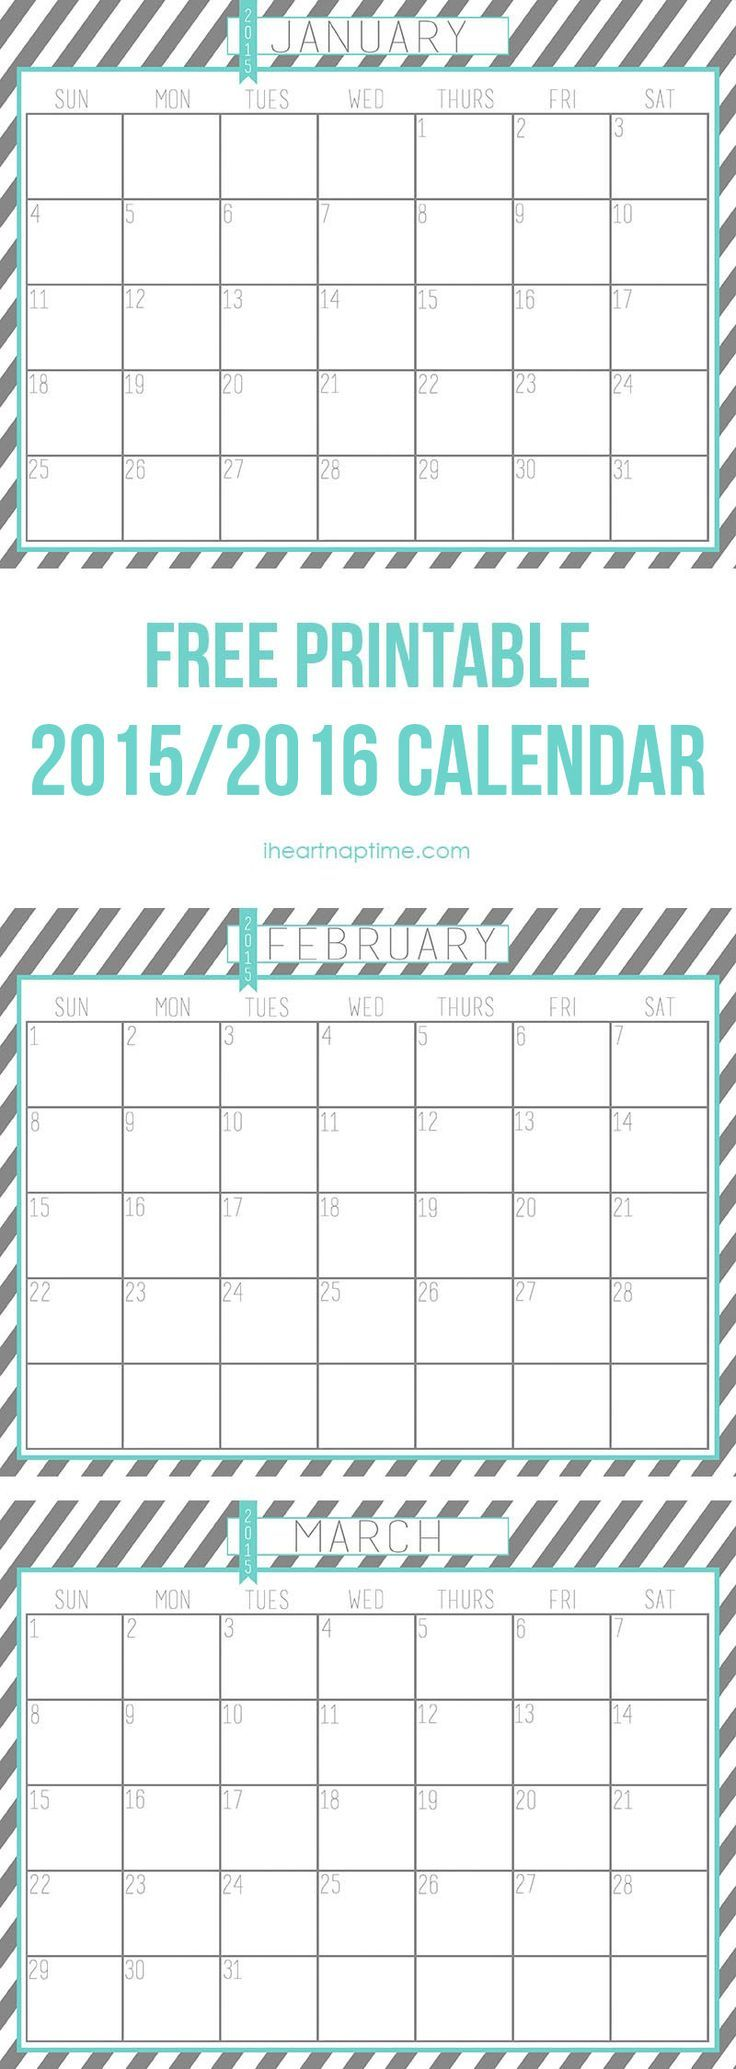 2015 - 2016 free printable calendar on iheartnaptime.com: